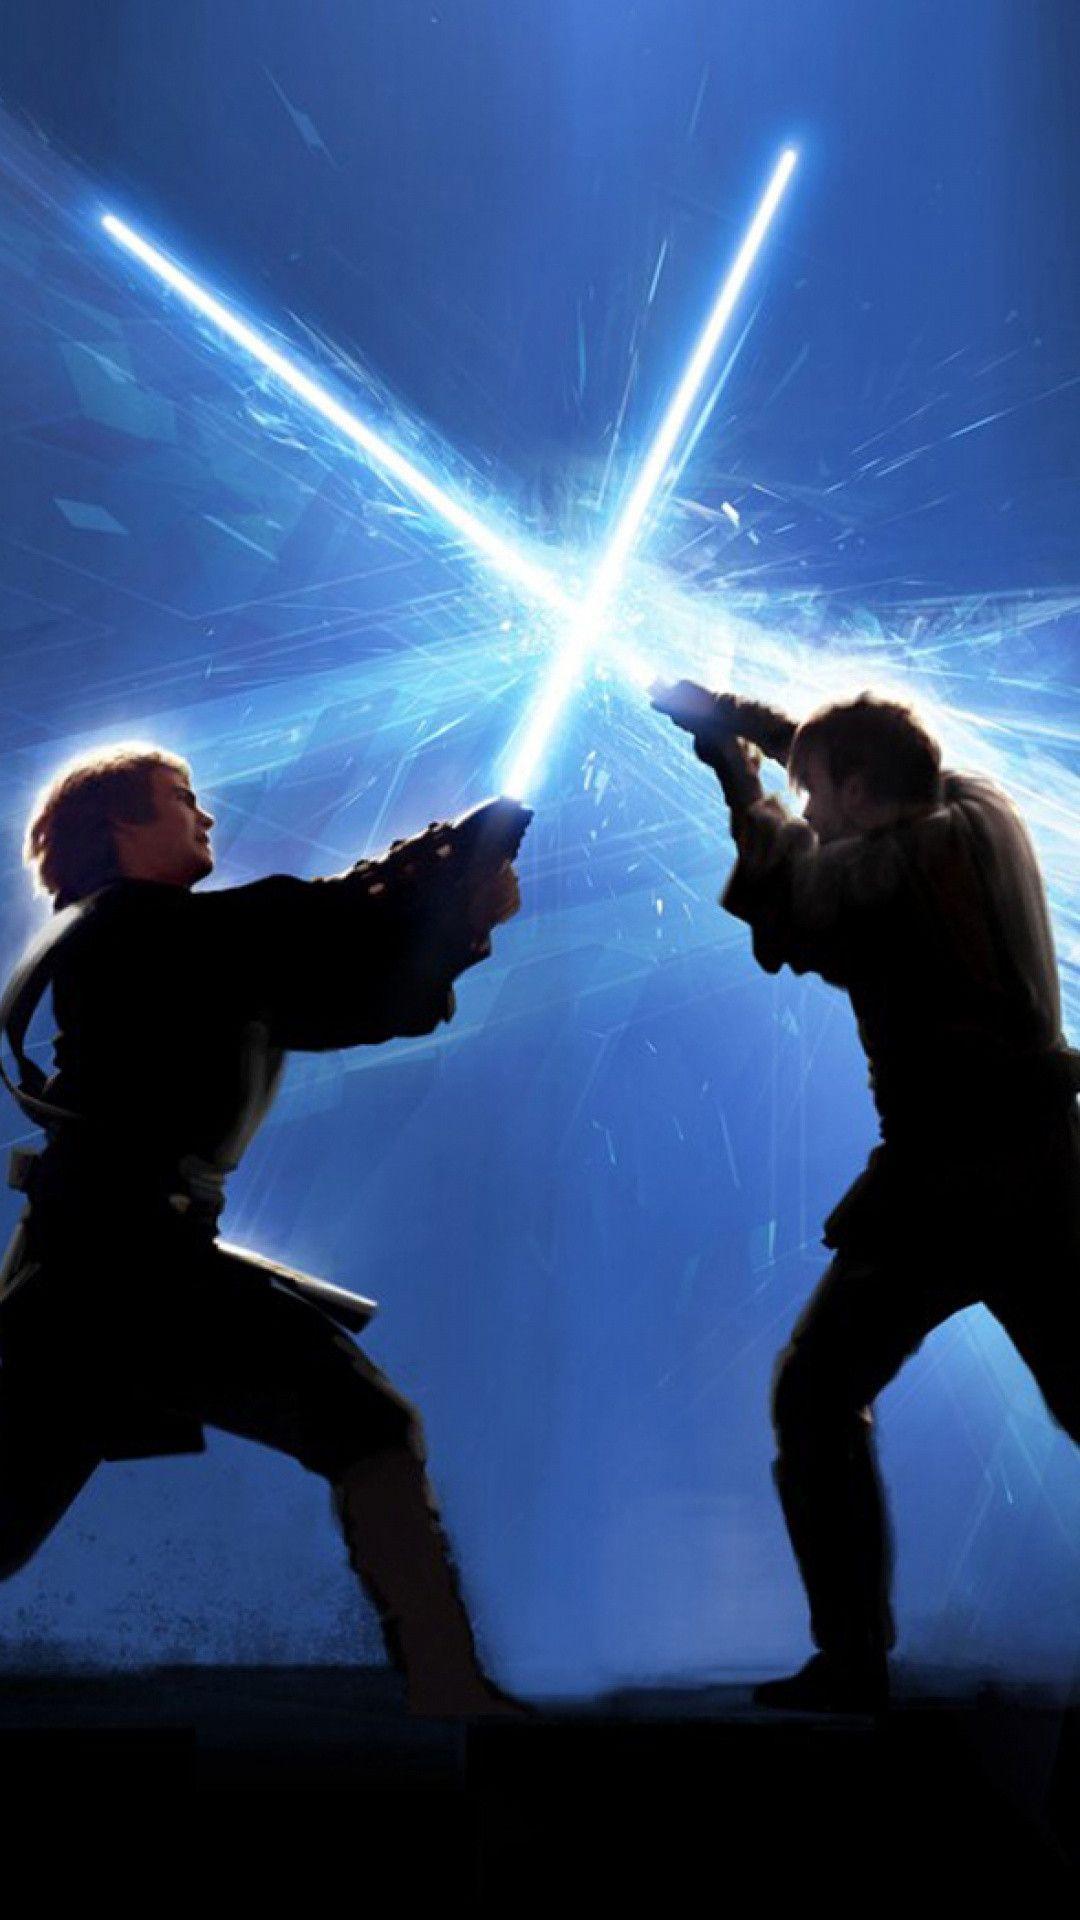 Anakin vs ObiWan battle of the heroes Star Wars